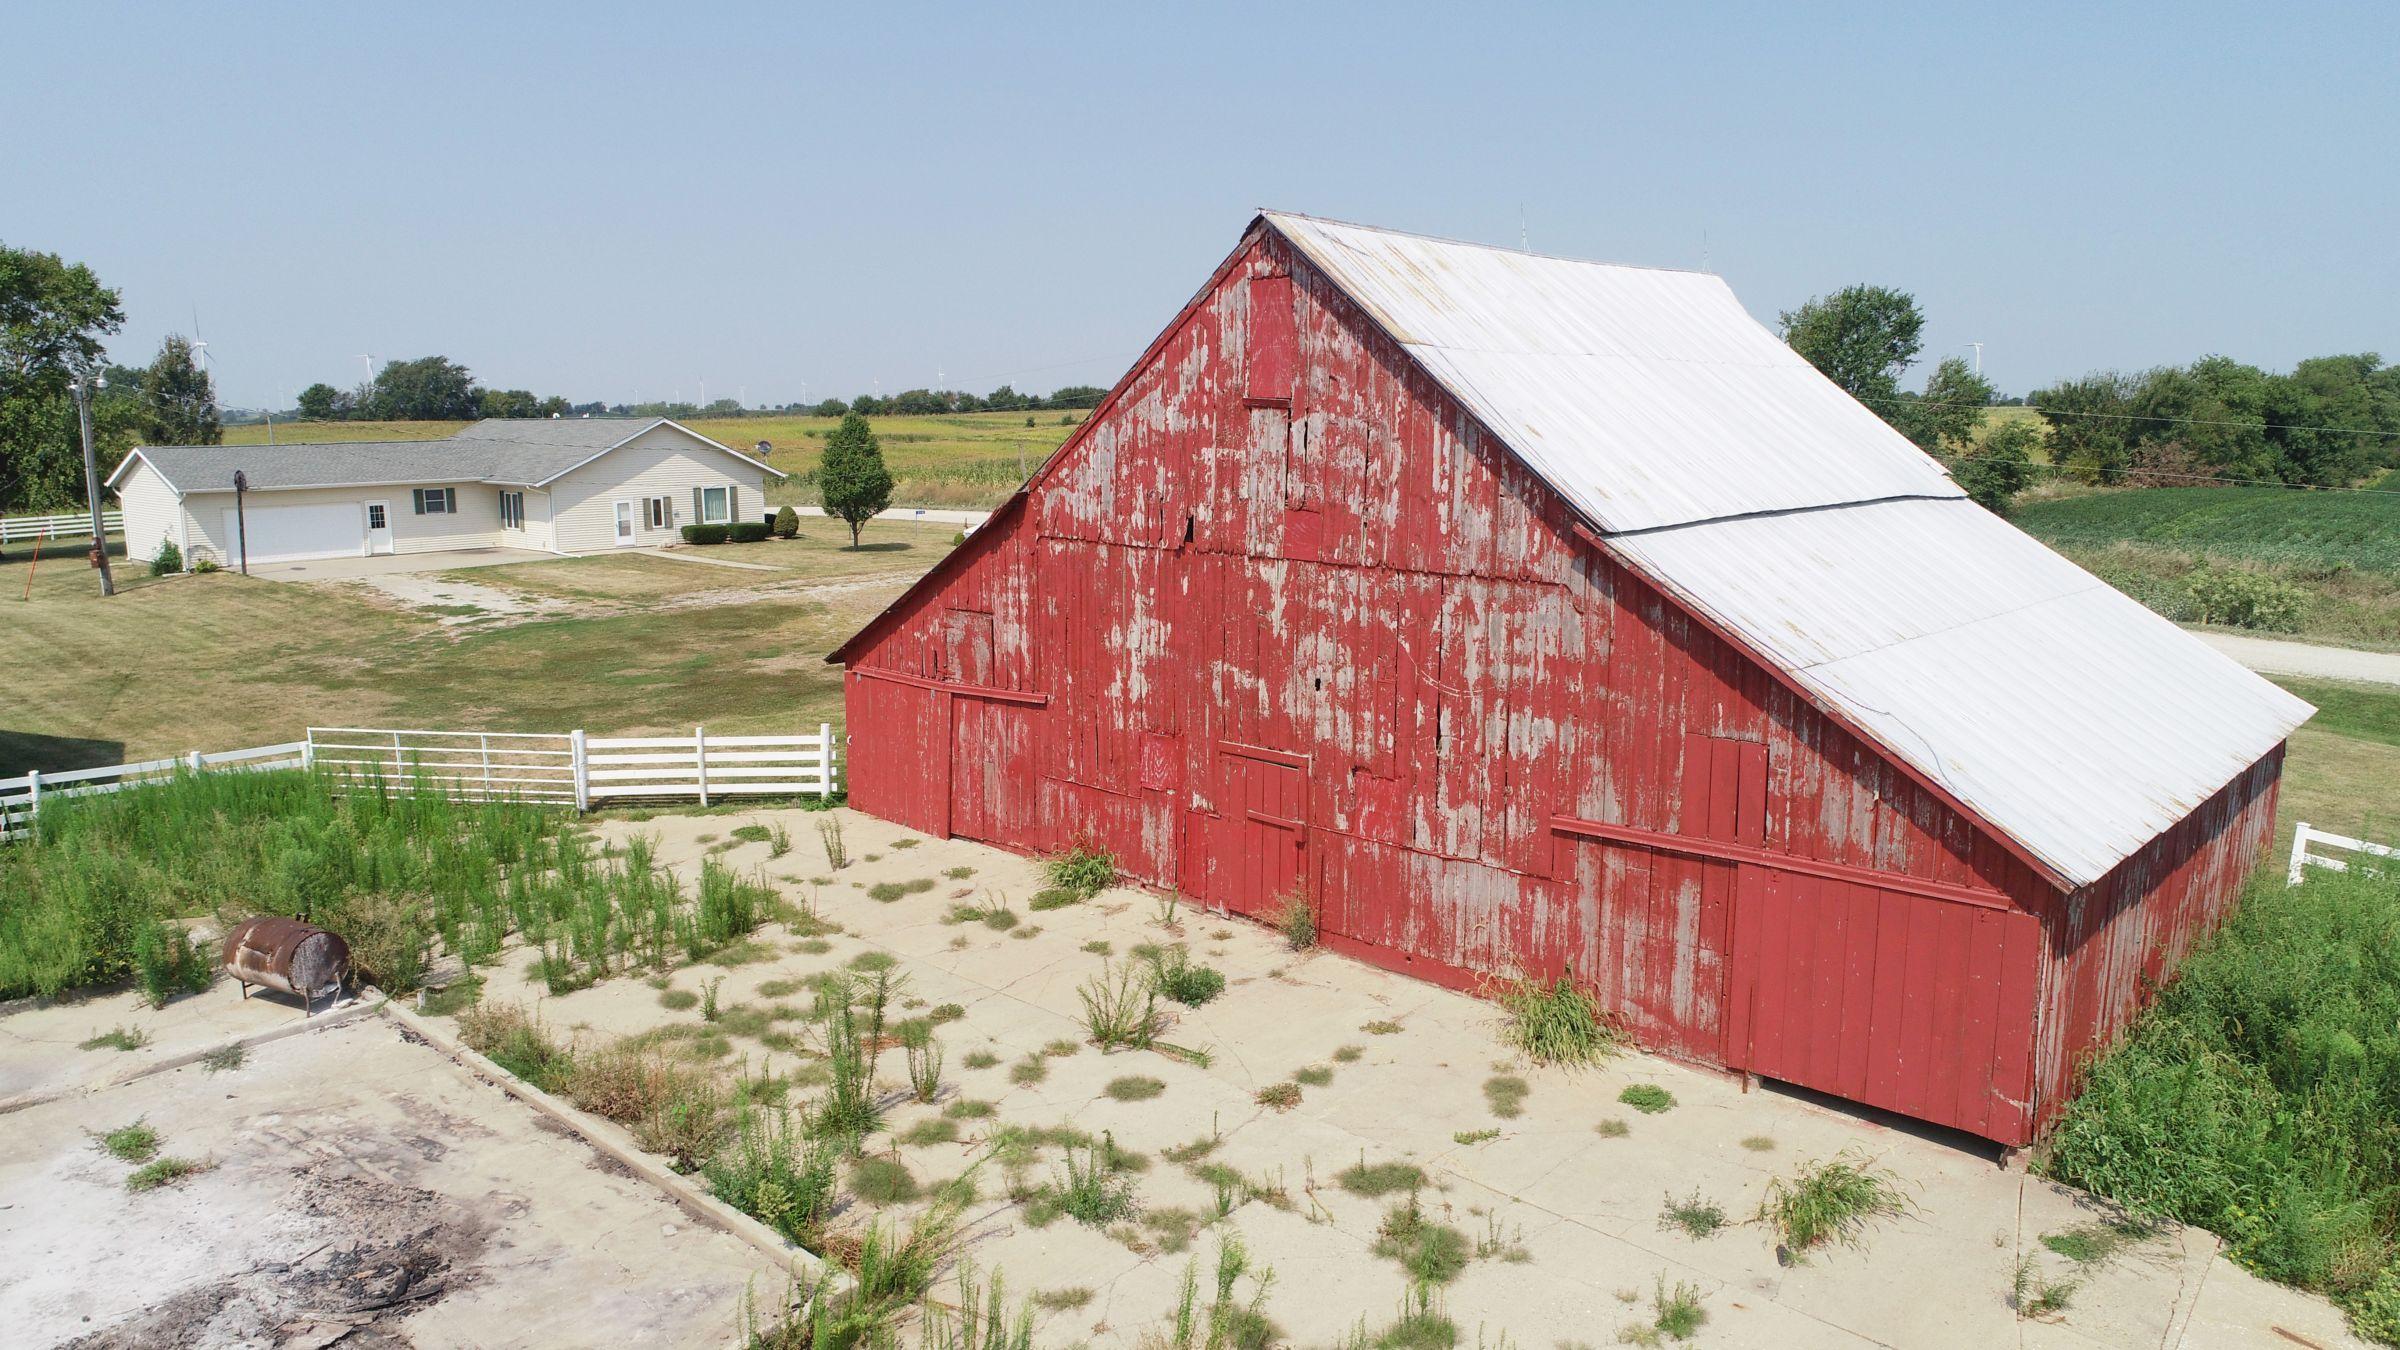 residential-land-poweshiek-county-iowa-5-acres-listing-number-15149-4-2020-08-28-201124.jpg